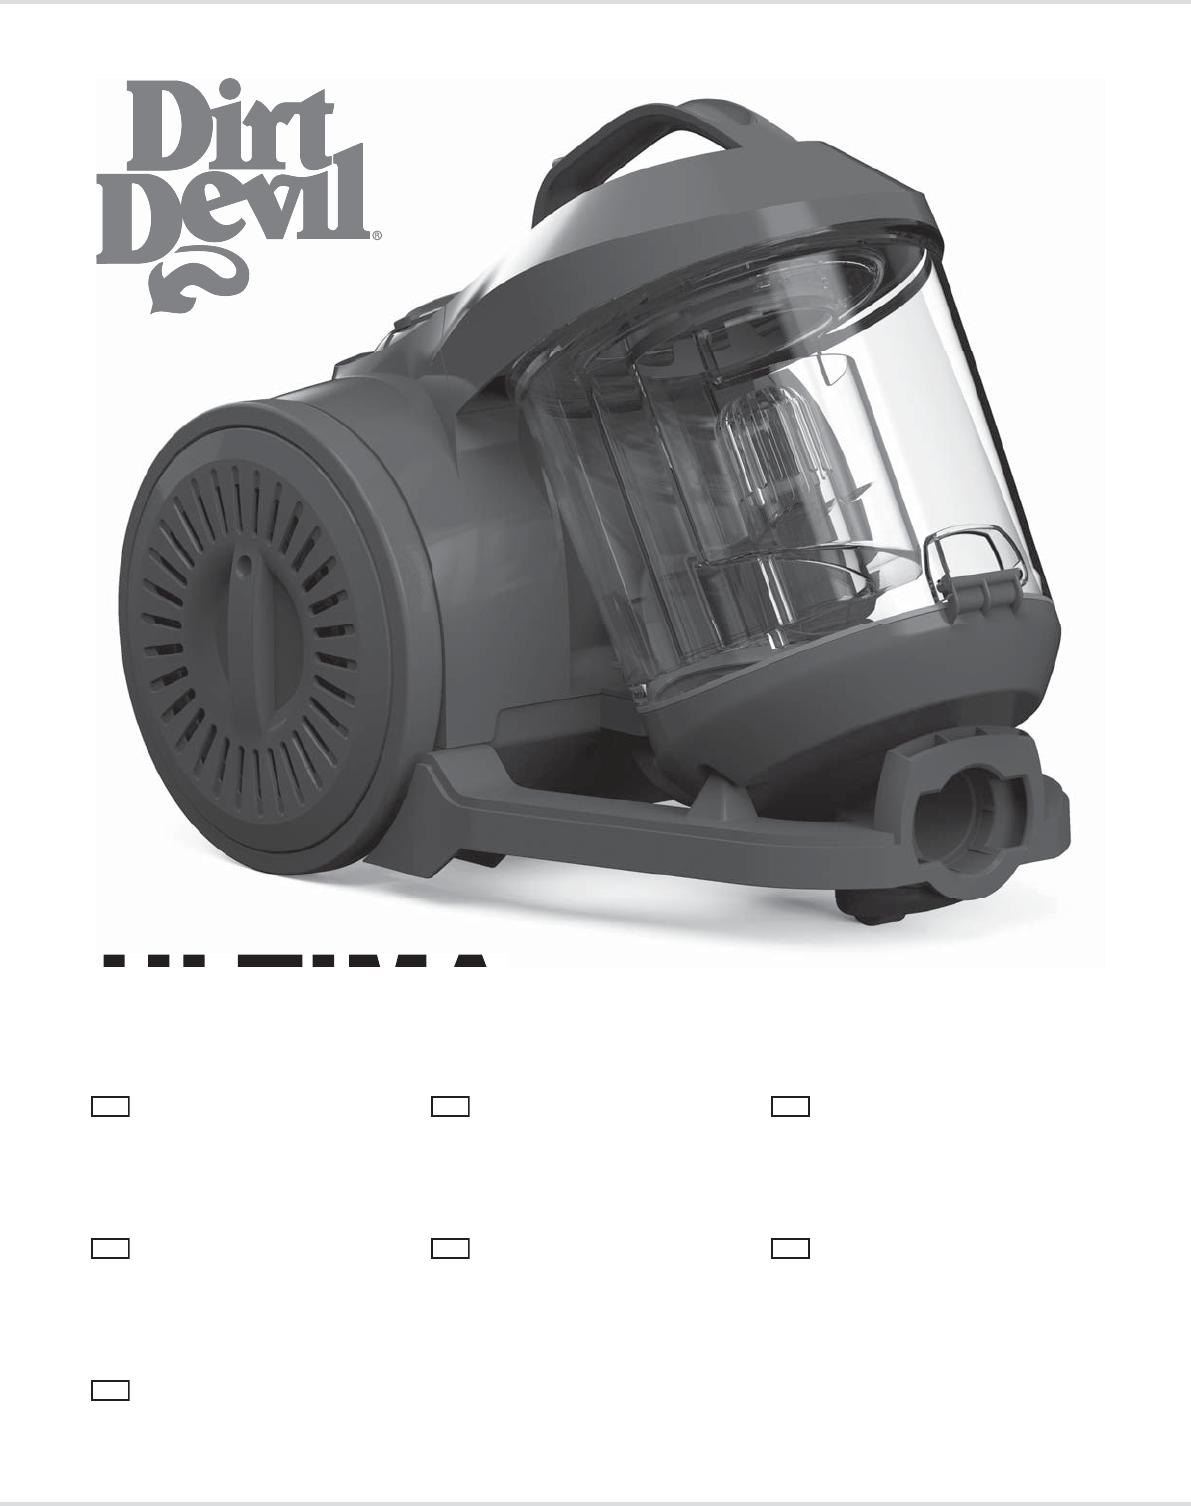 FILTRI per Dirt Devil ultima 3-er ultima Power Parquet